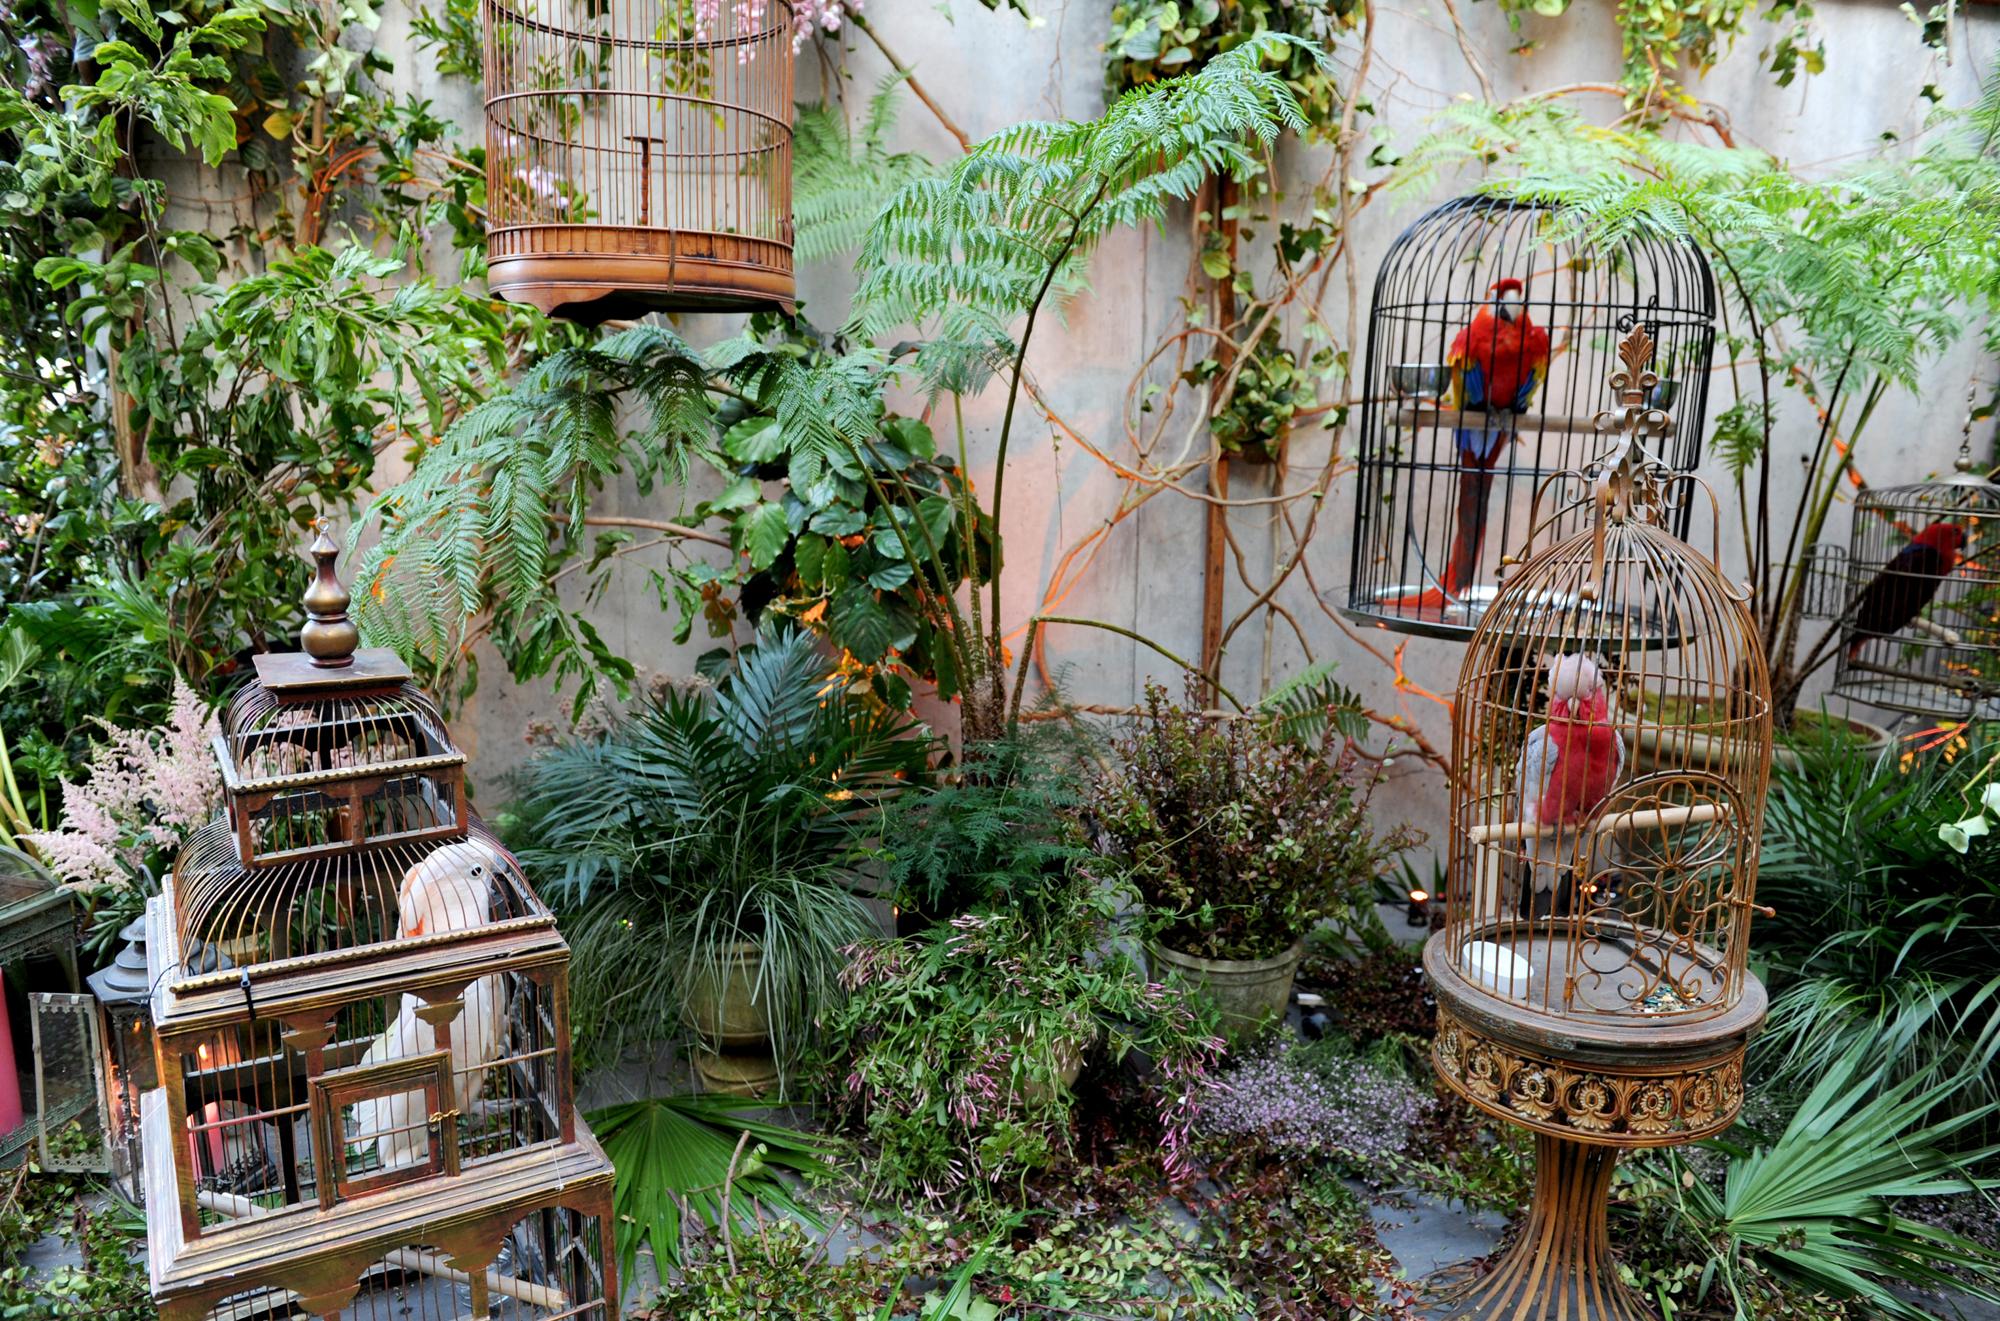 gucci birds